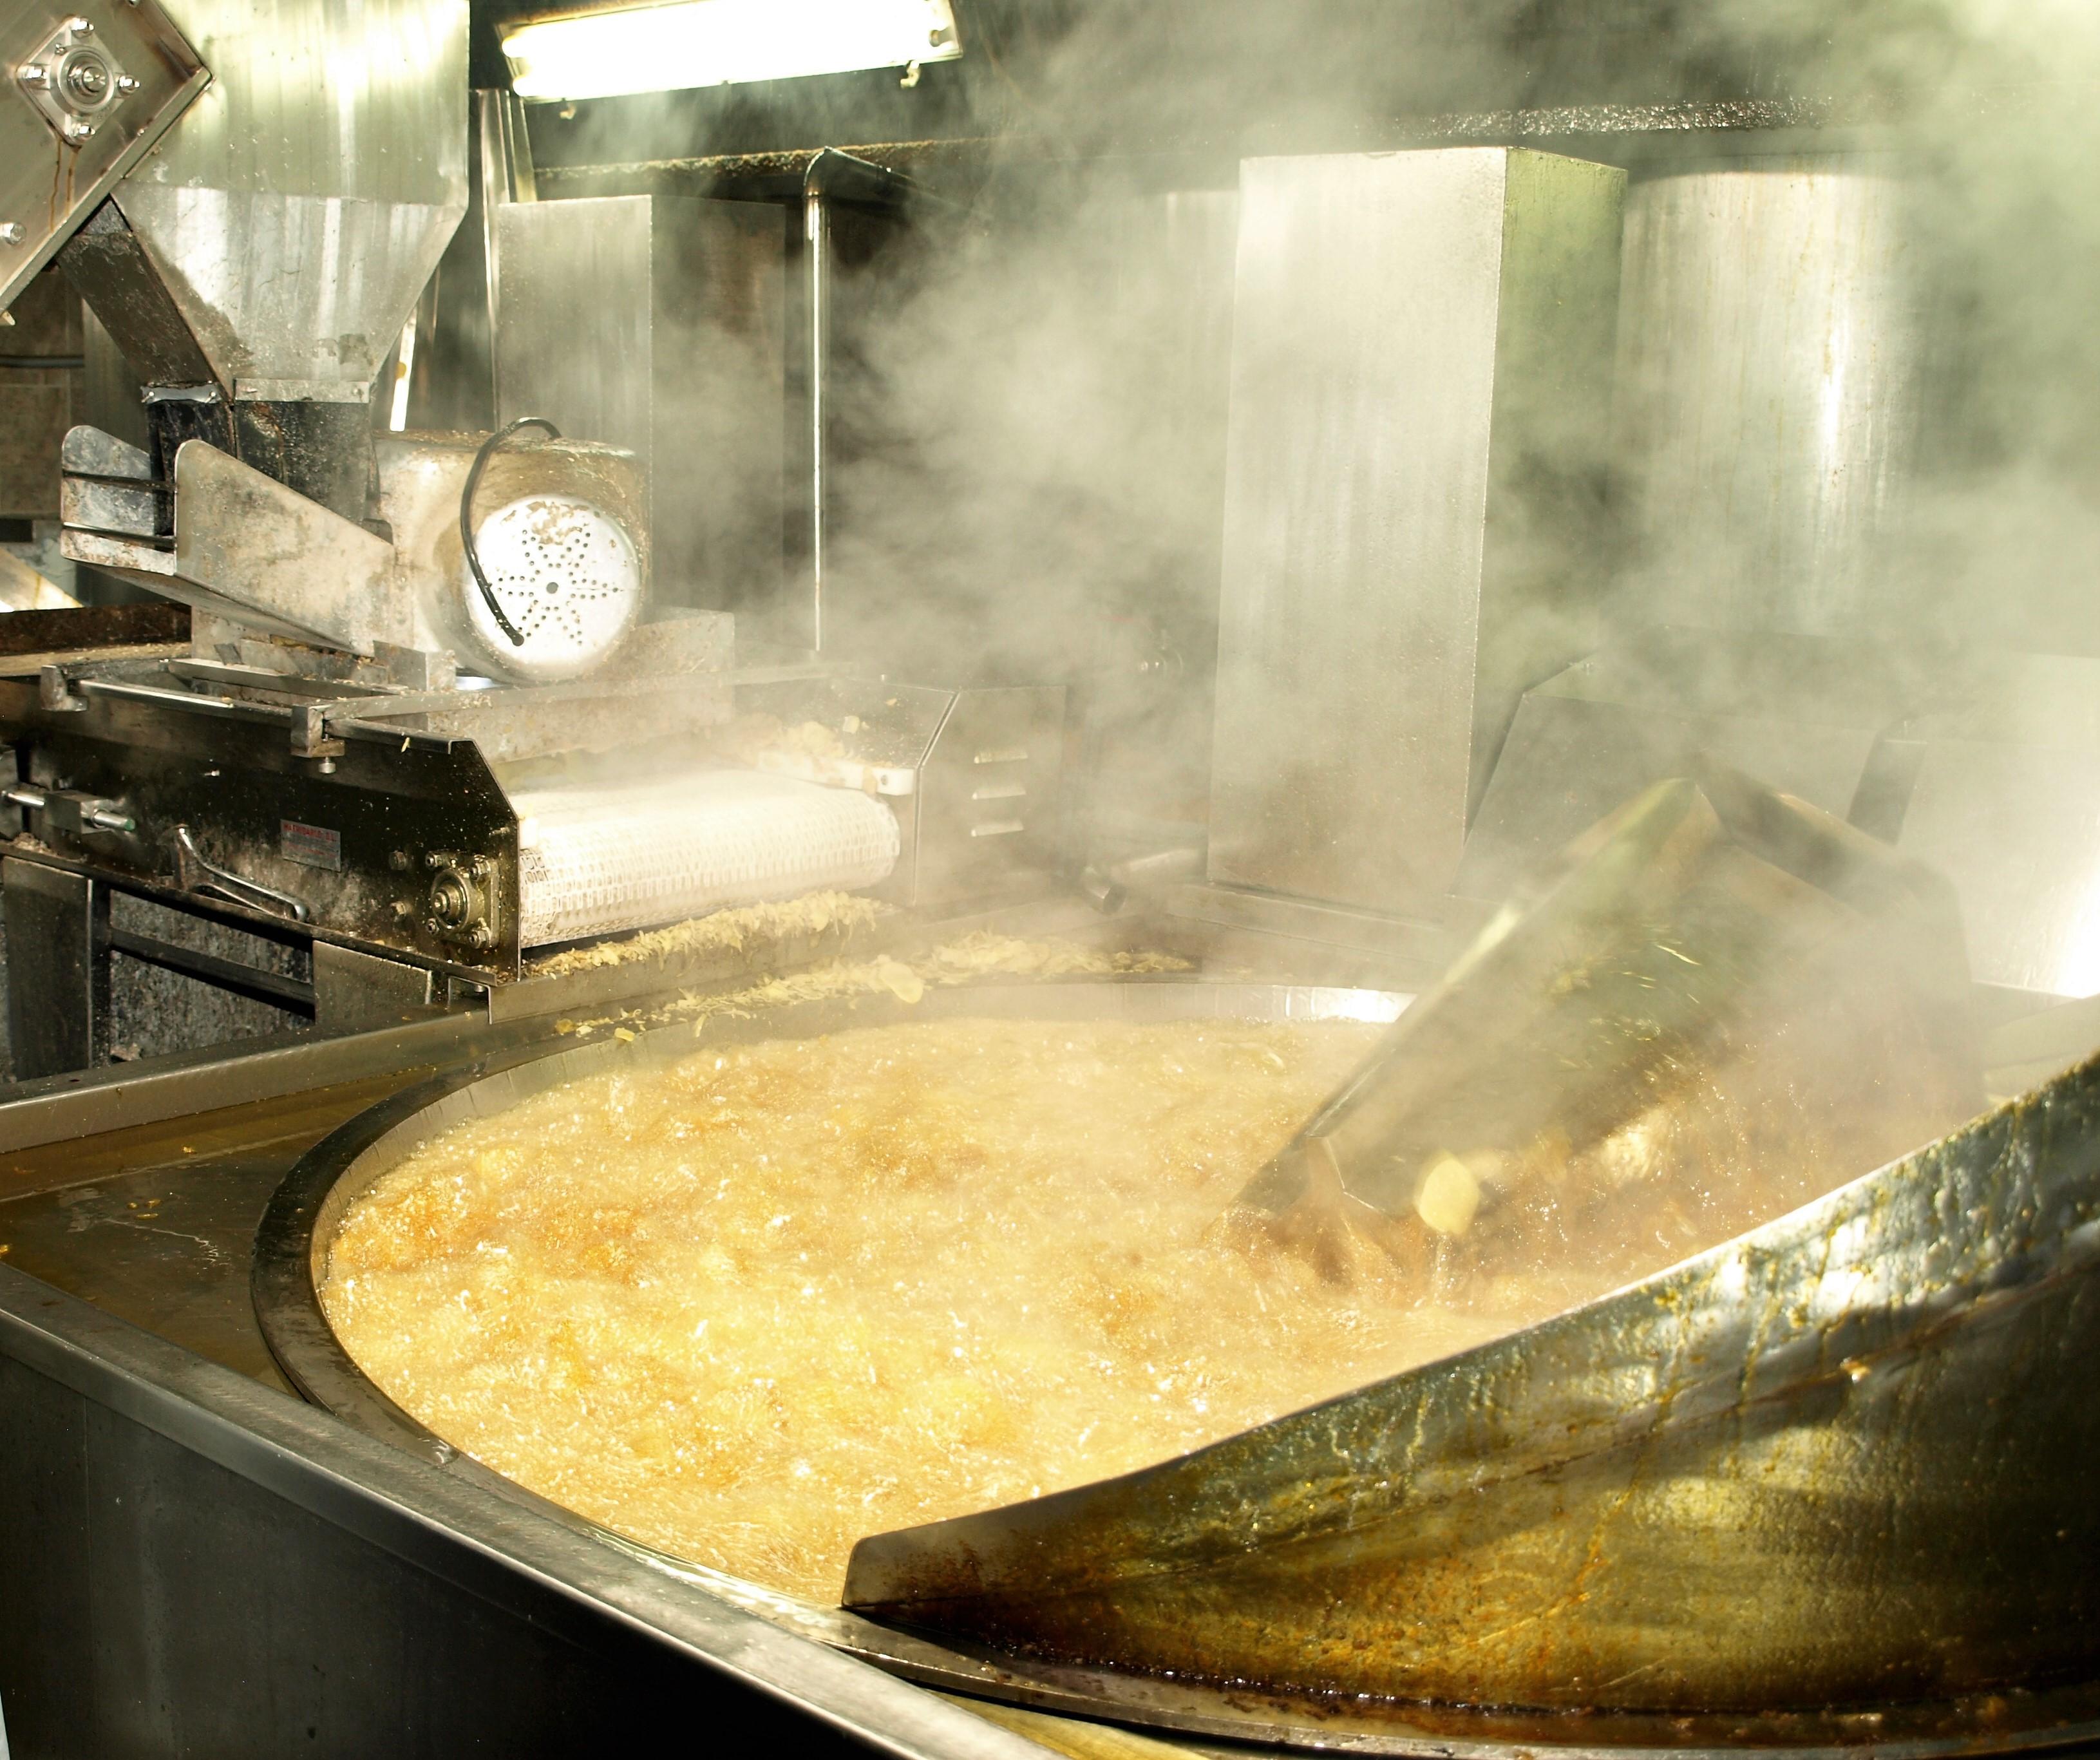 Fabrica Patatas fritas Extremadura El Gallo